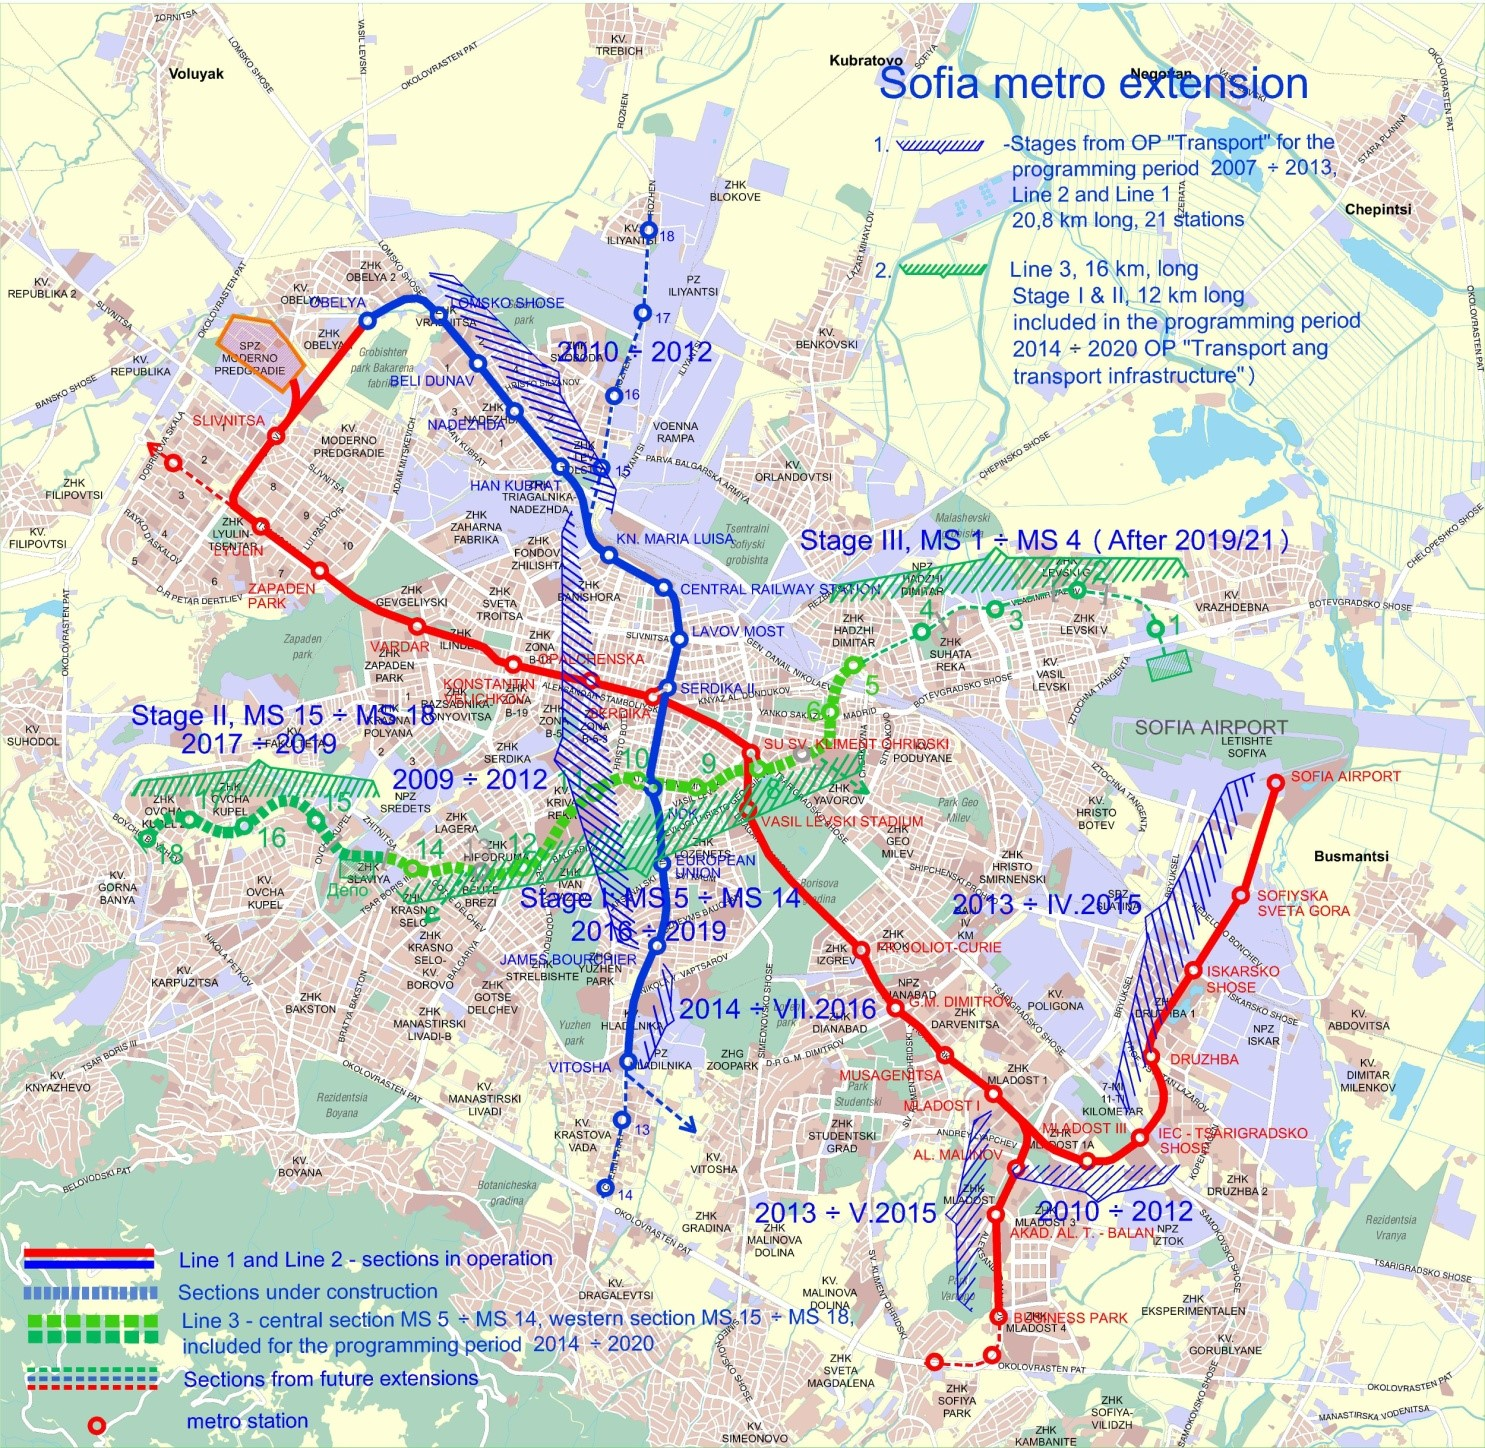 Sofia Subway Map.Stage 1 Metropolitan Sofia